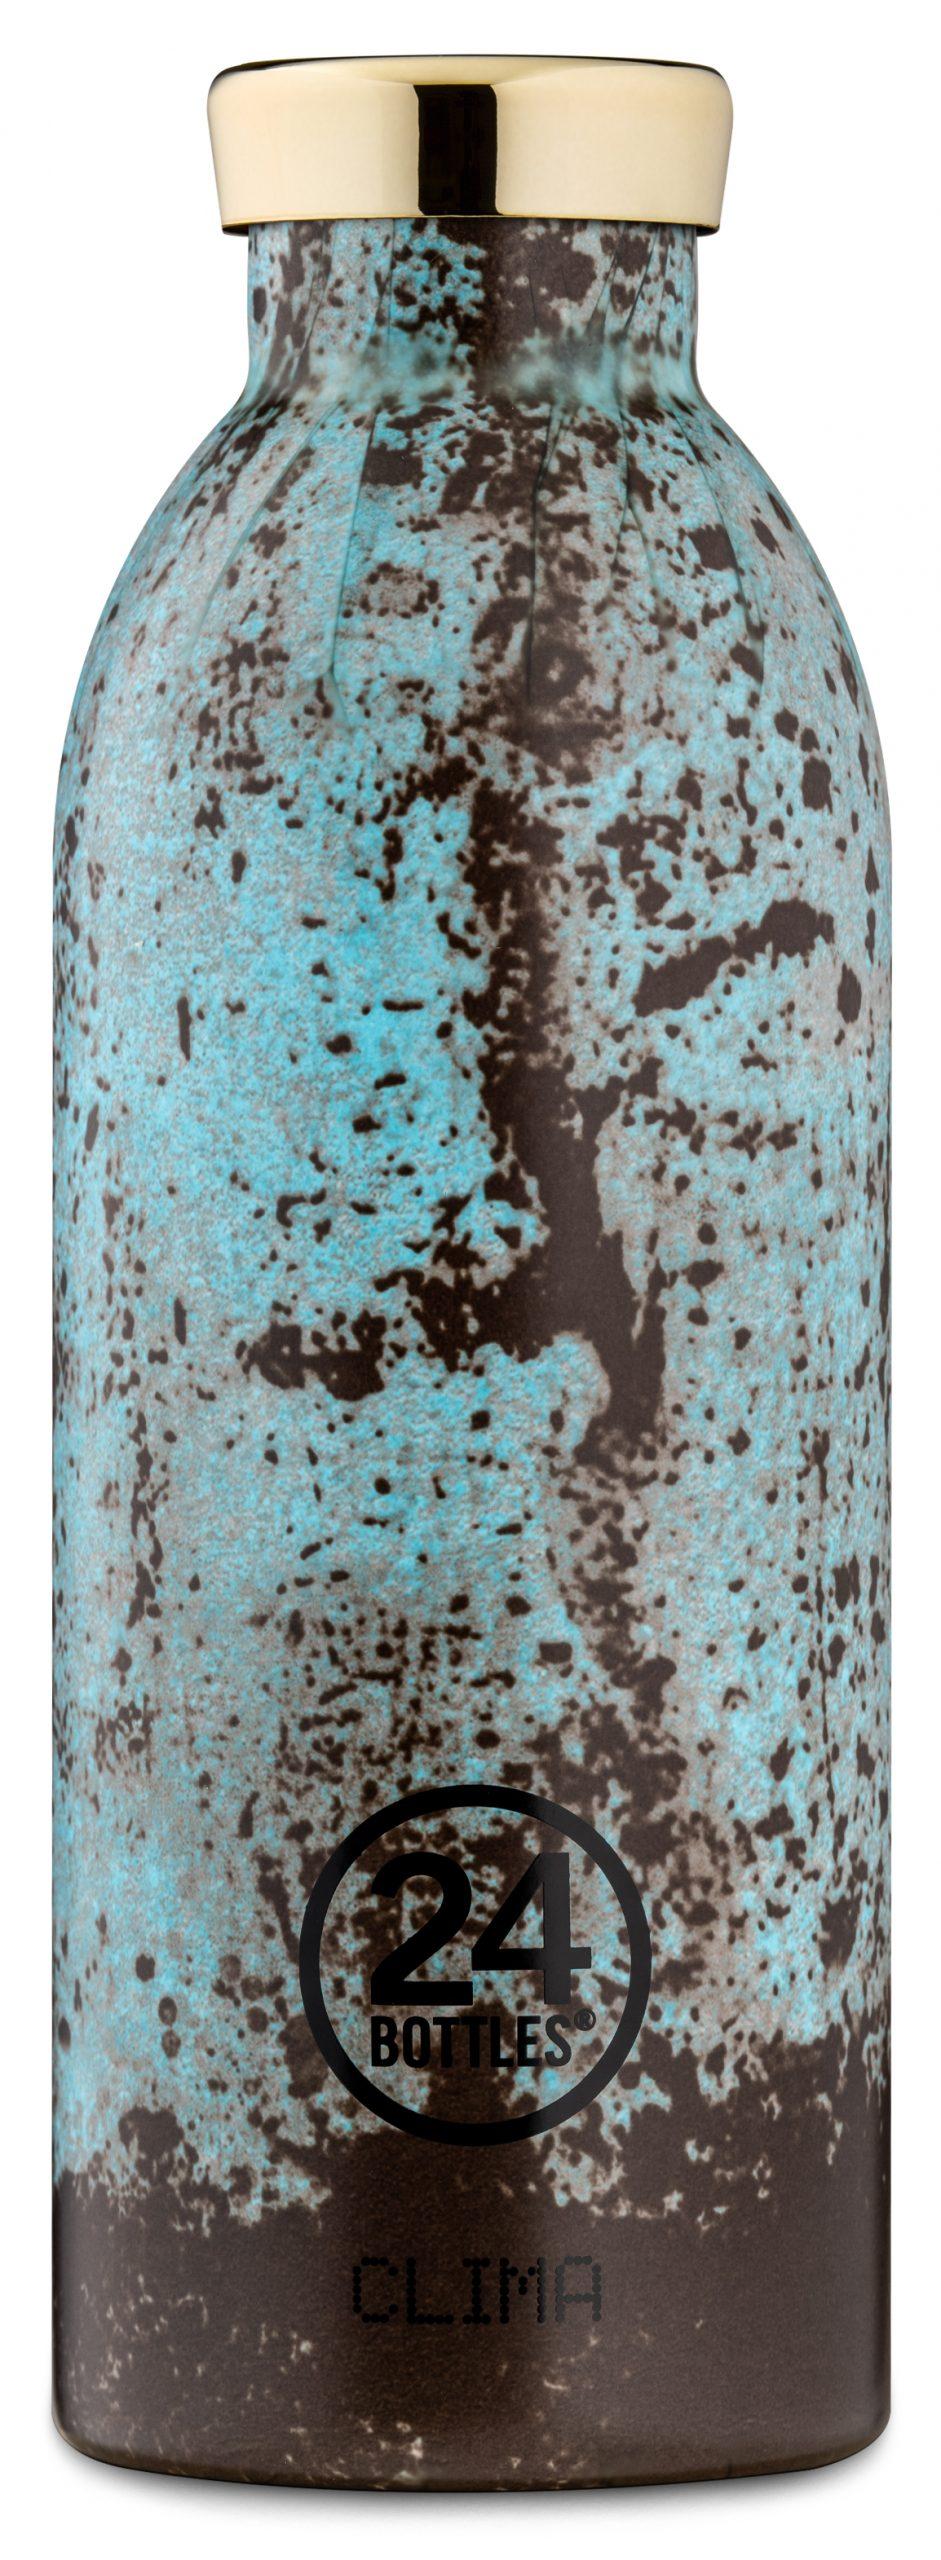 24bottles® Clima Bottle 500ml – Riace